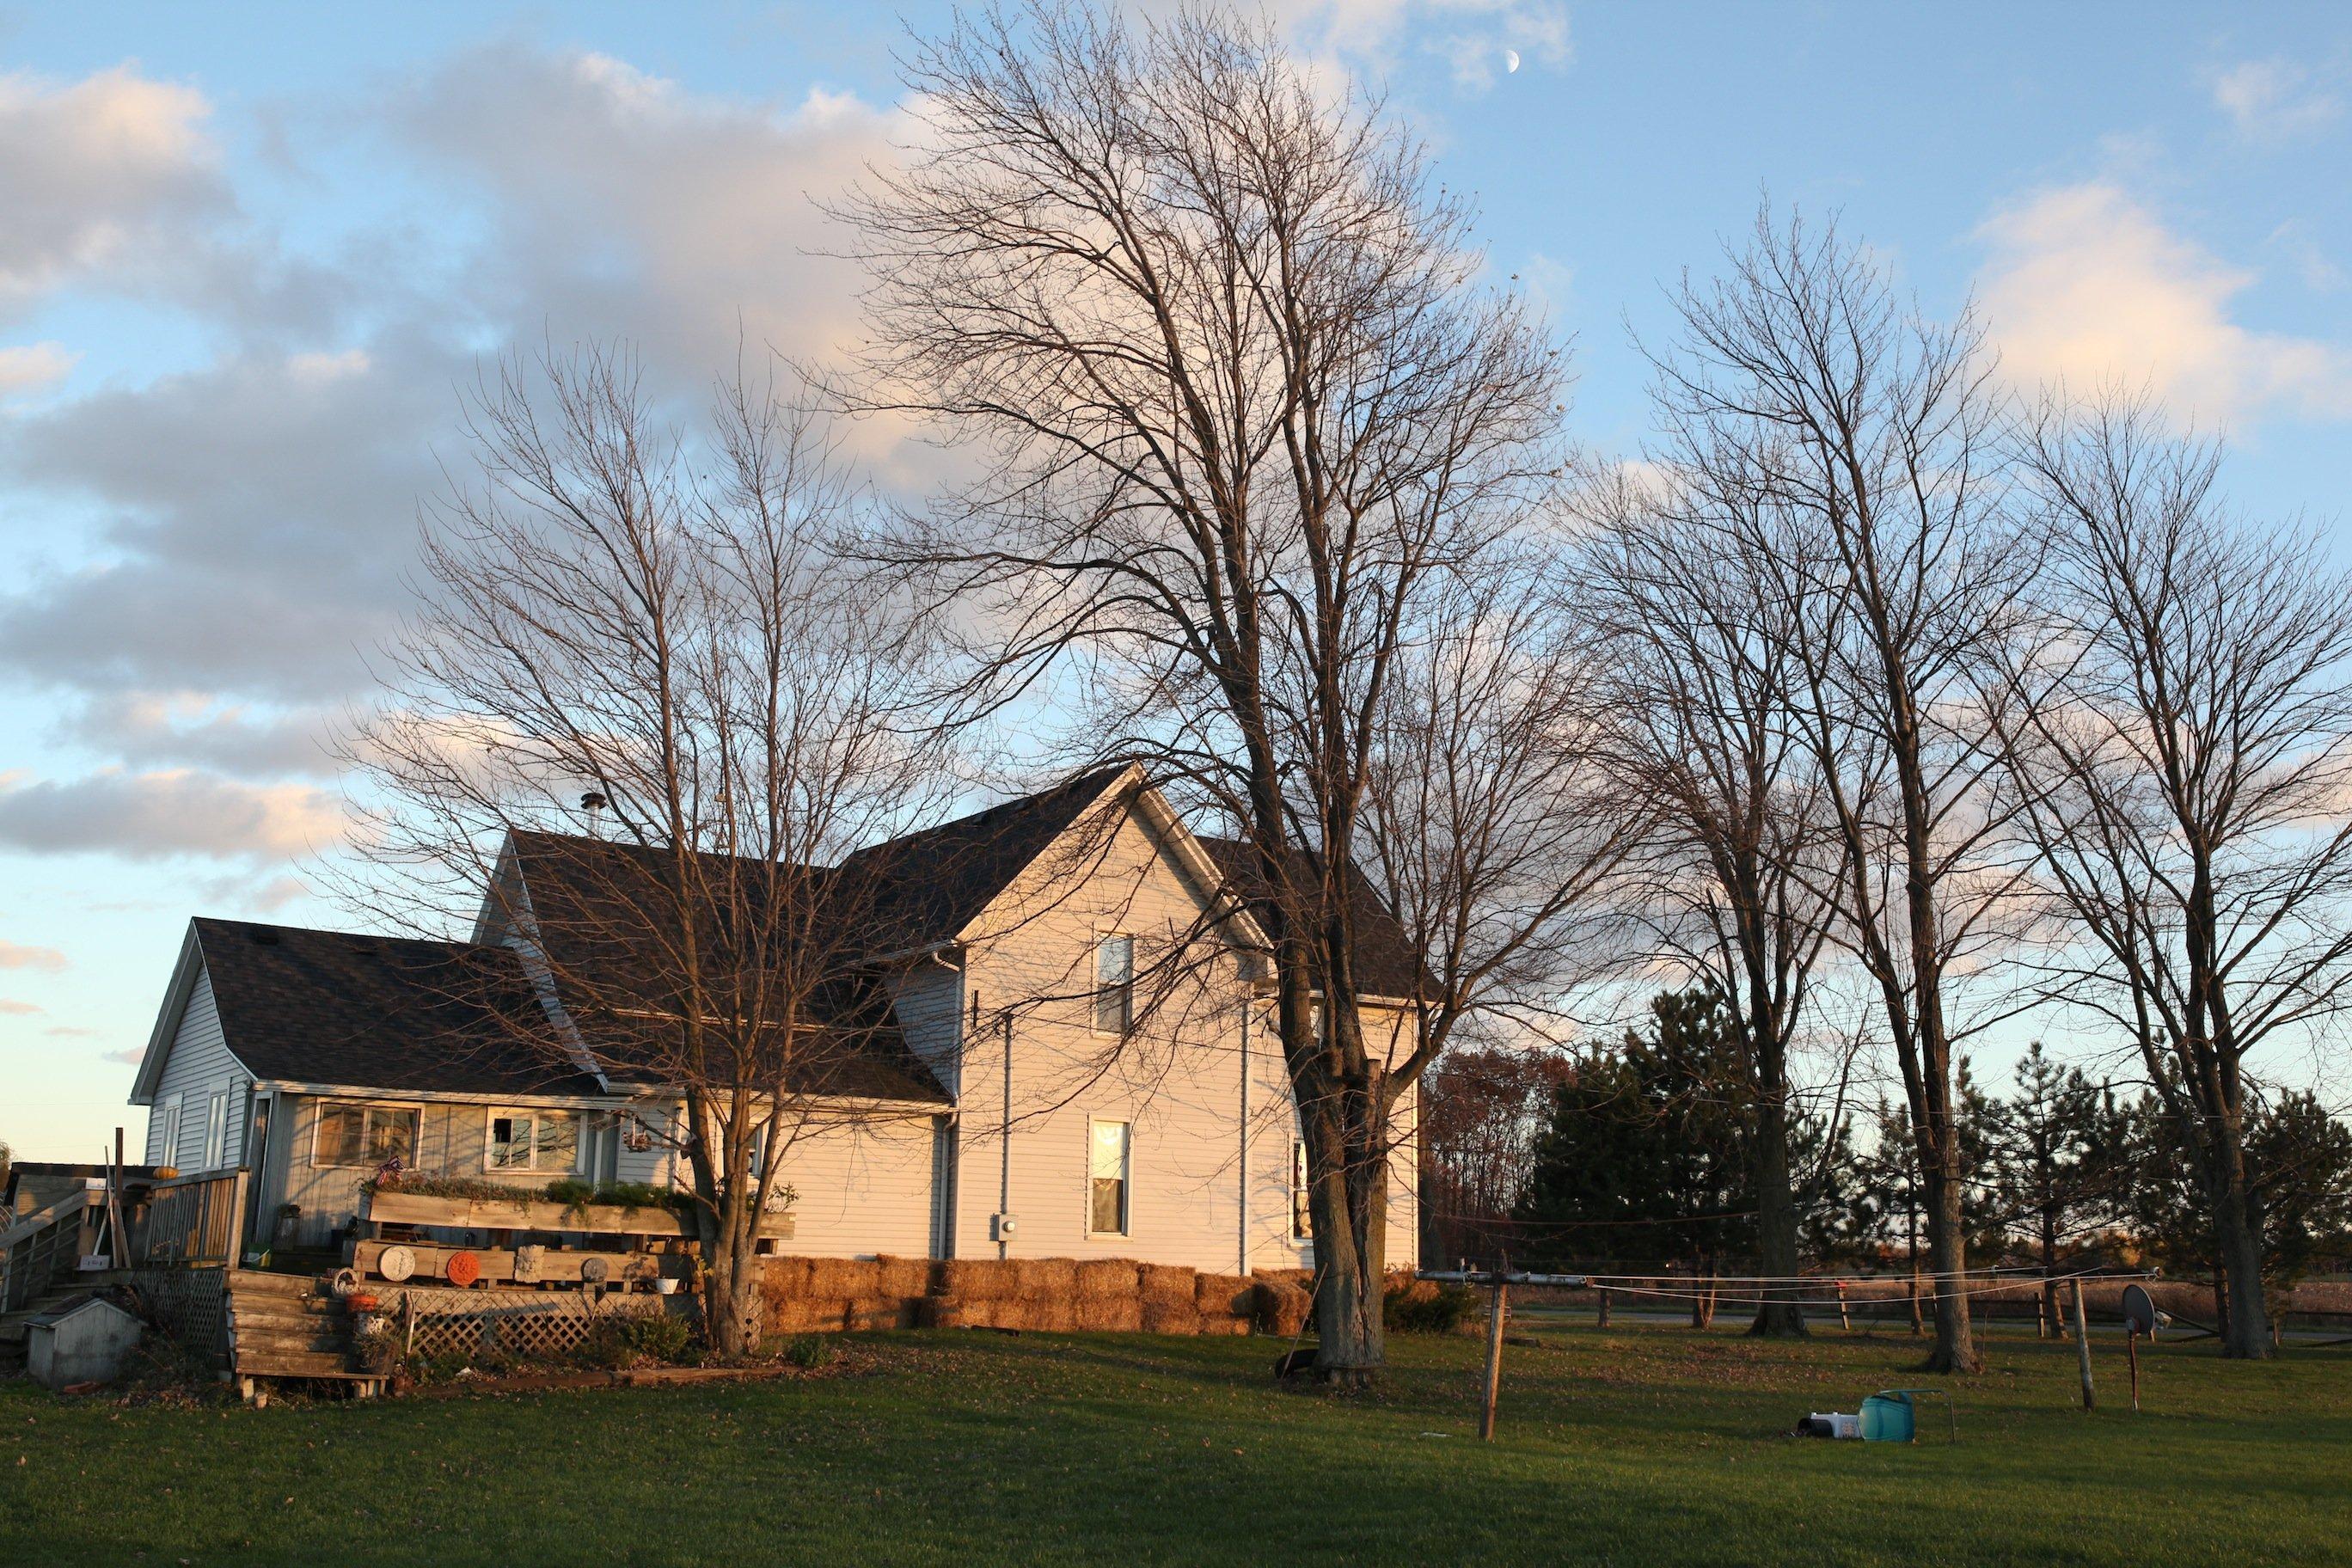 farmhouse in fall w: bare trees